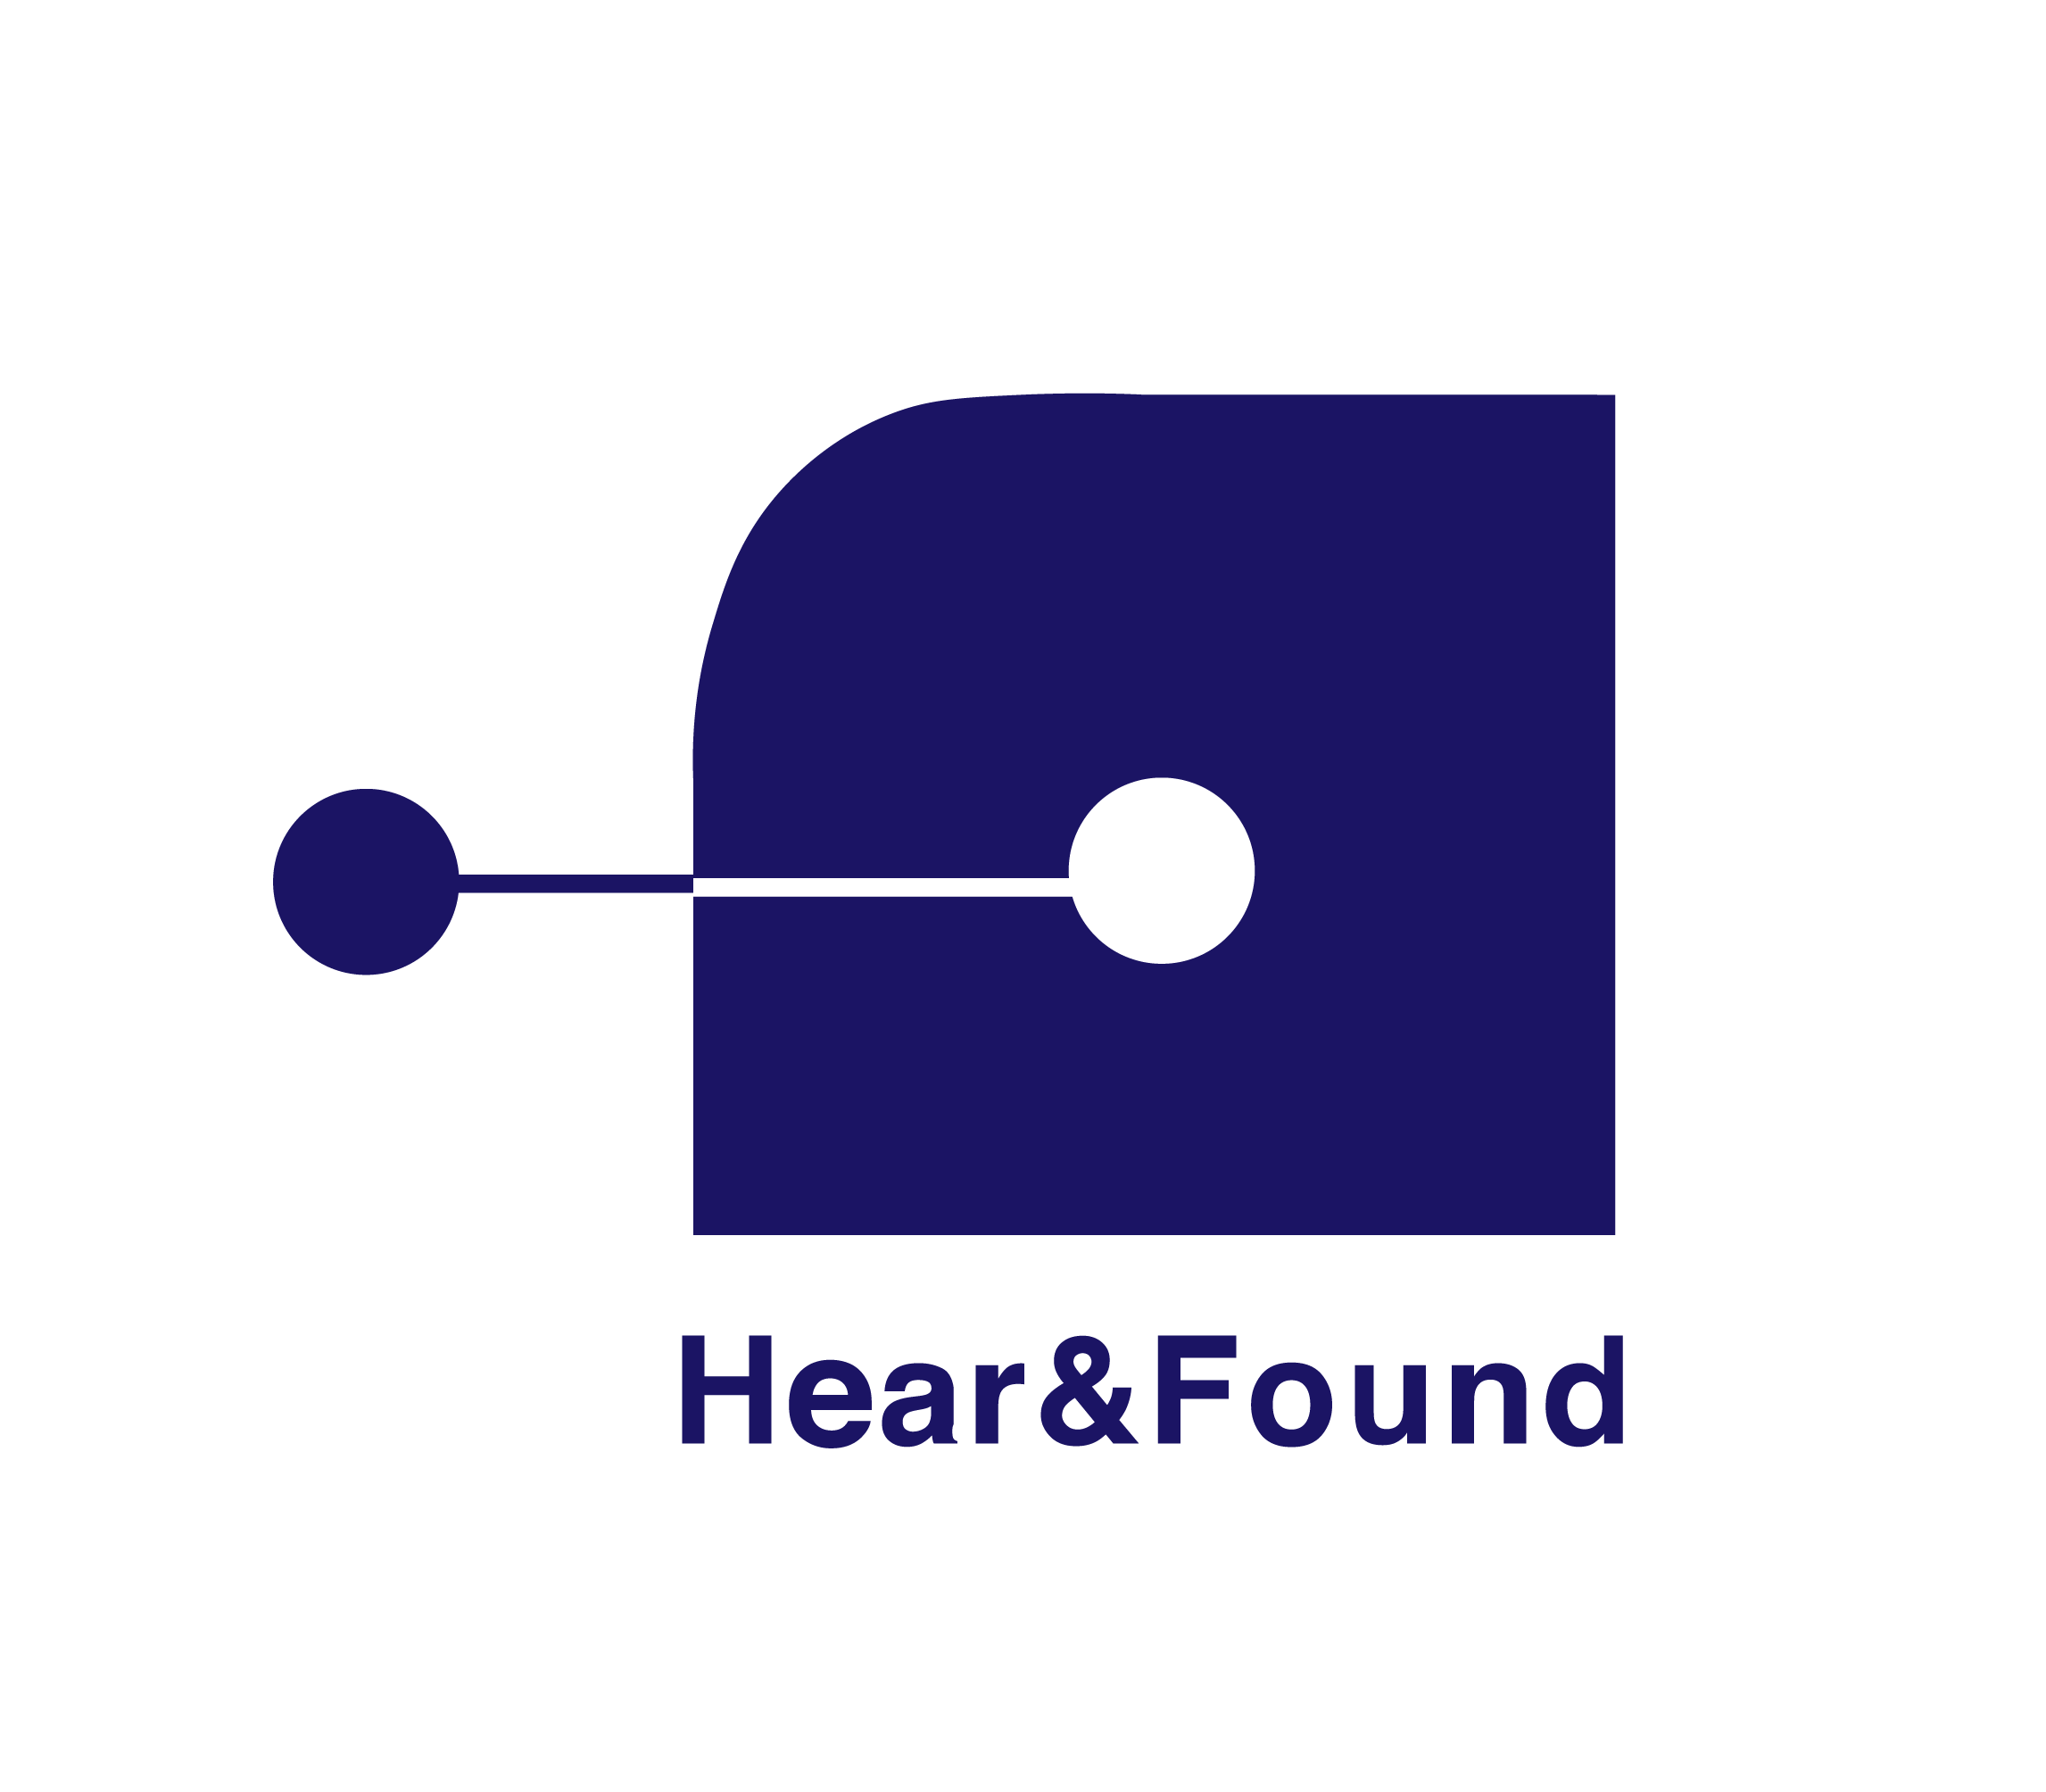 Hear & Found